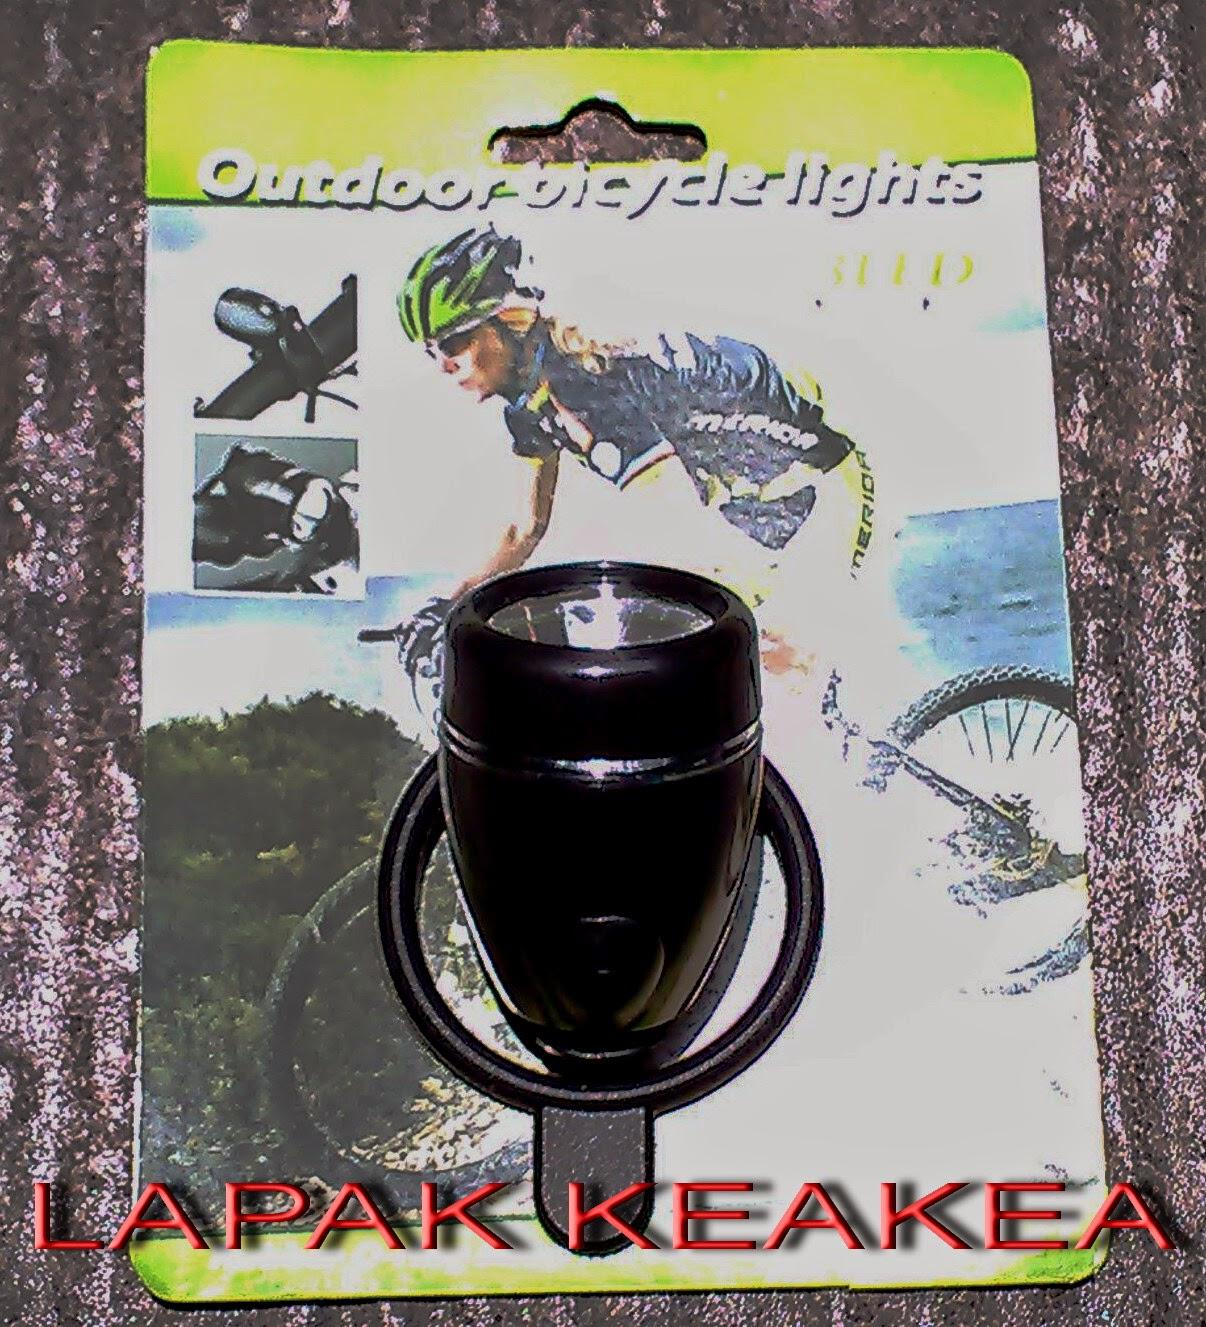 http://lapakkeakea.blogspot.com/search/label/lampu%20depan%20imut